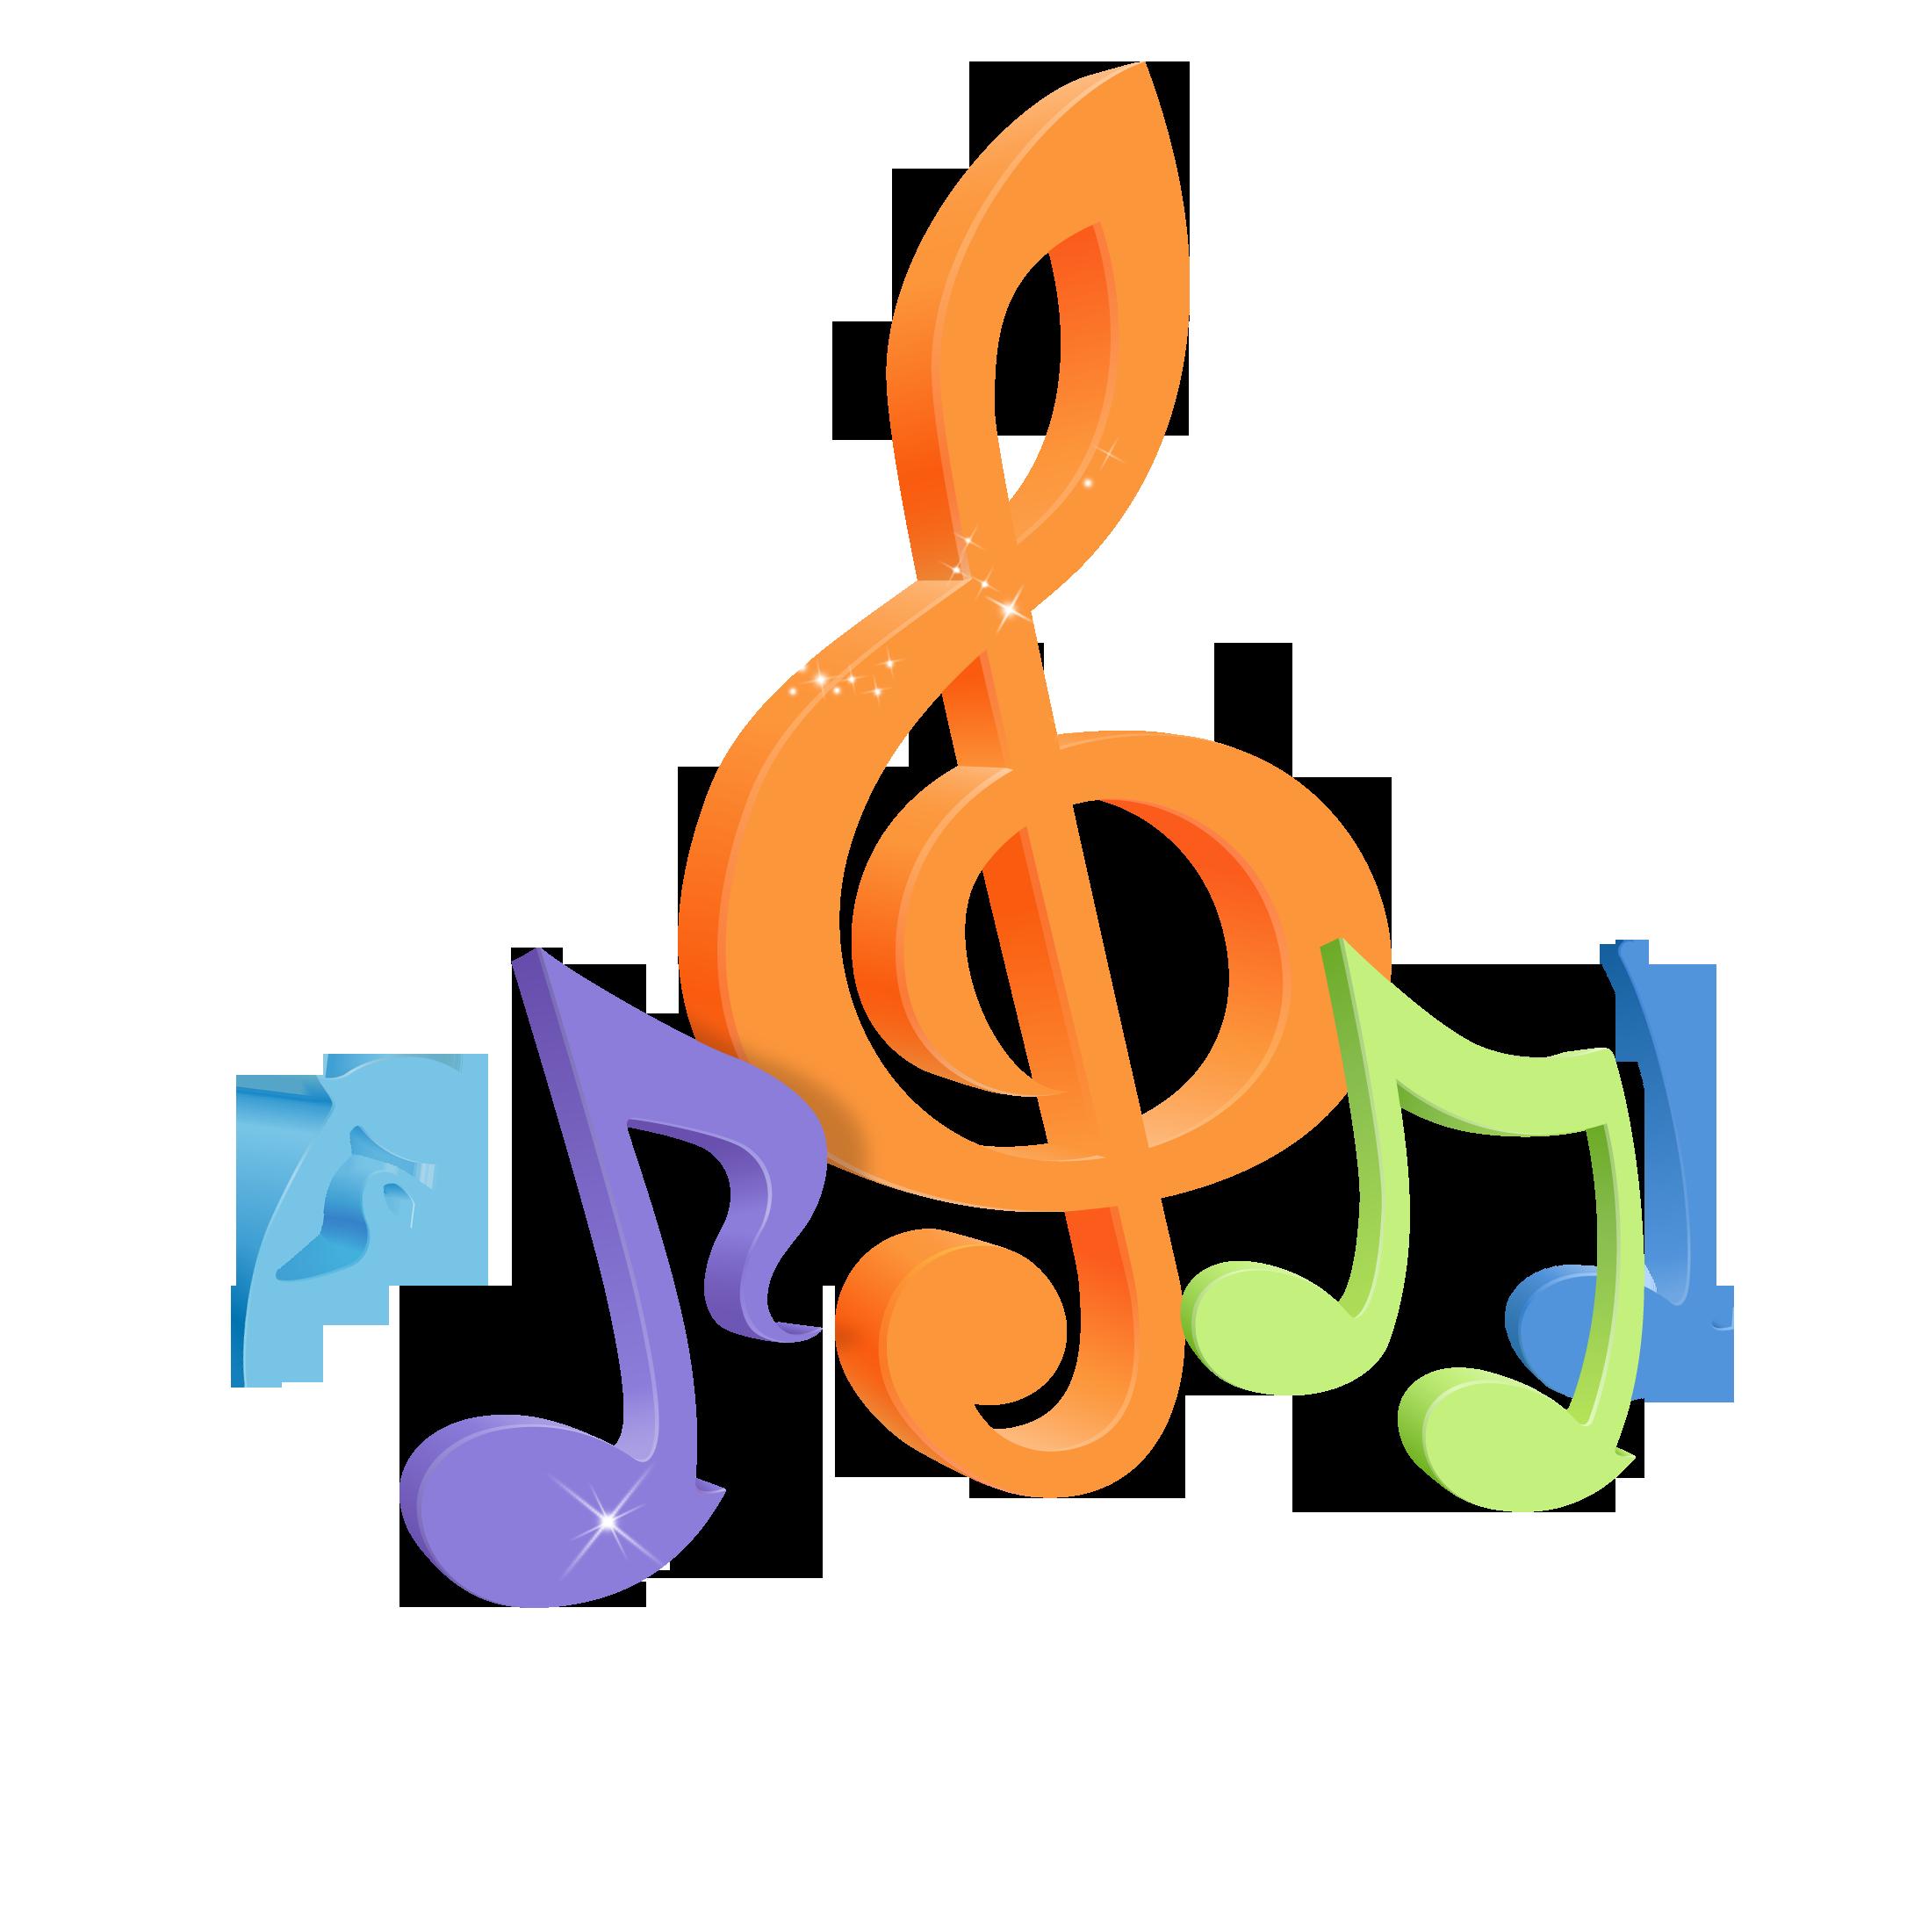 Musical note Desktop Wallpaper 4K resolution 1080p.